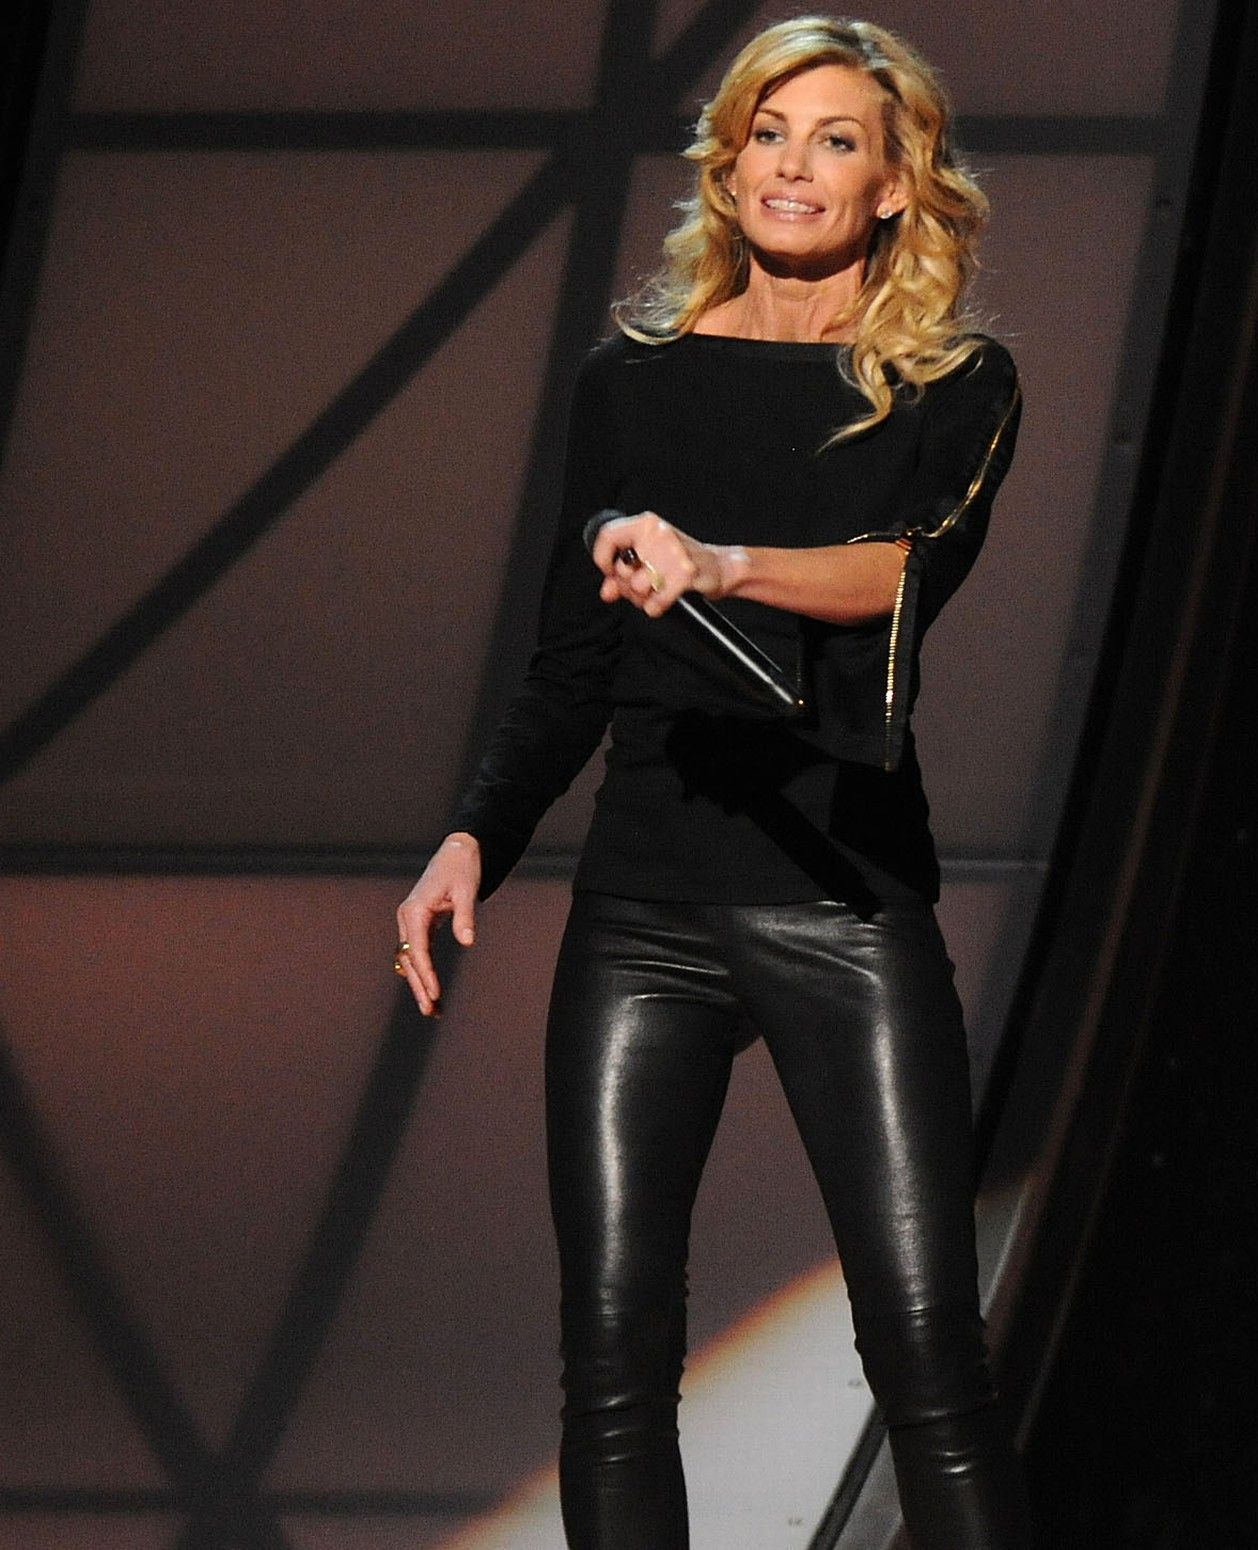 Anya black latex catsuit 5